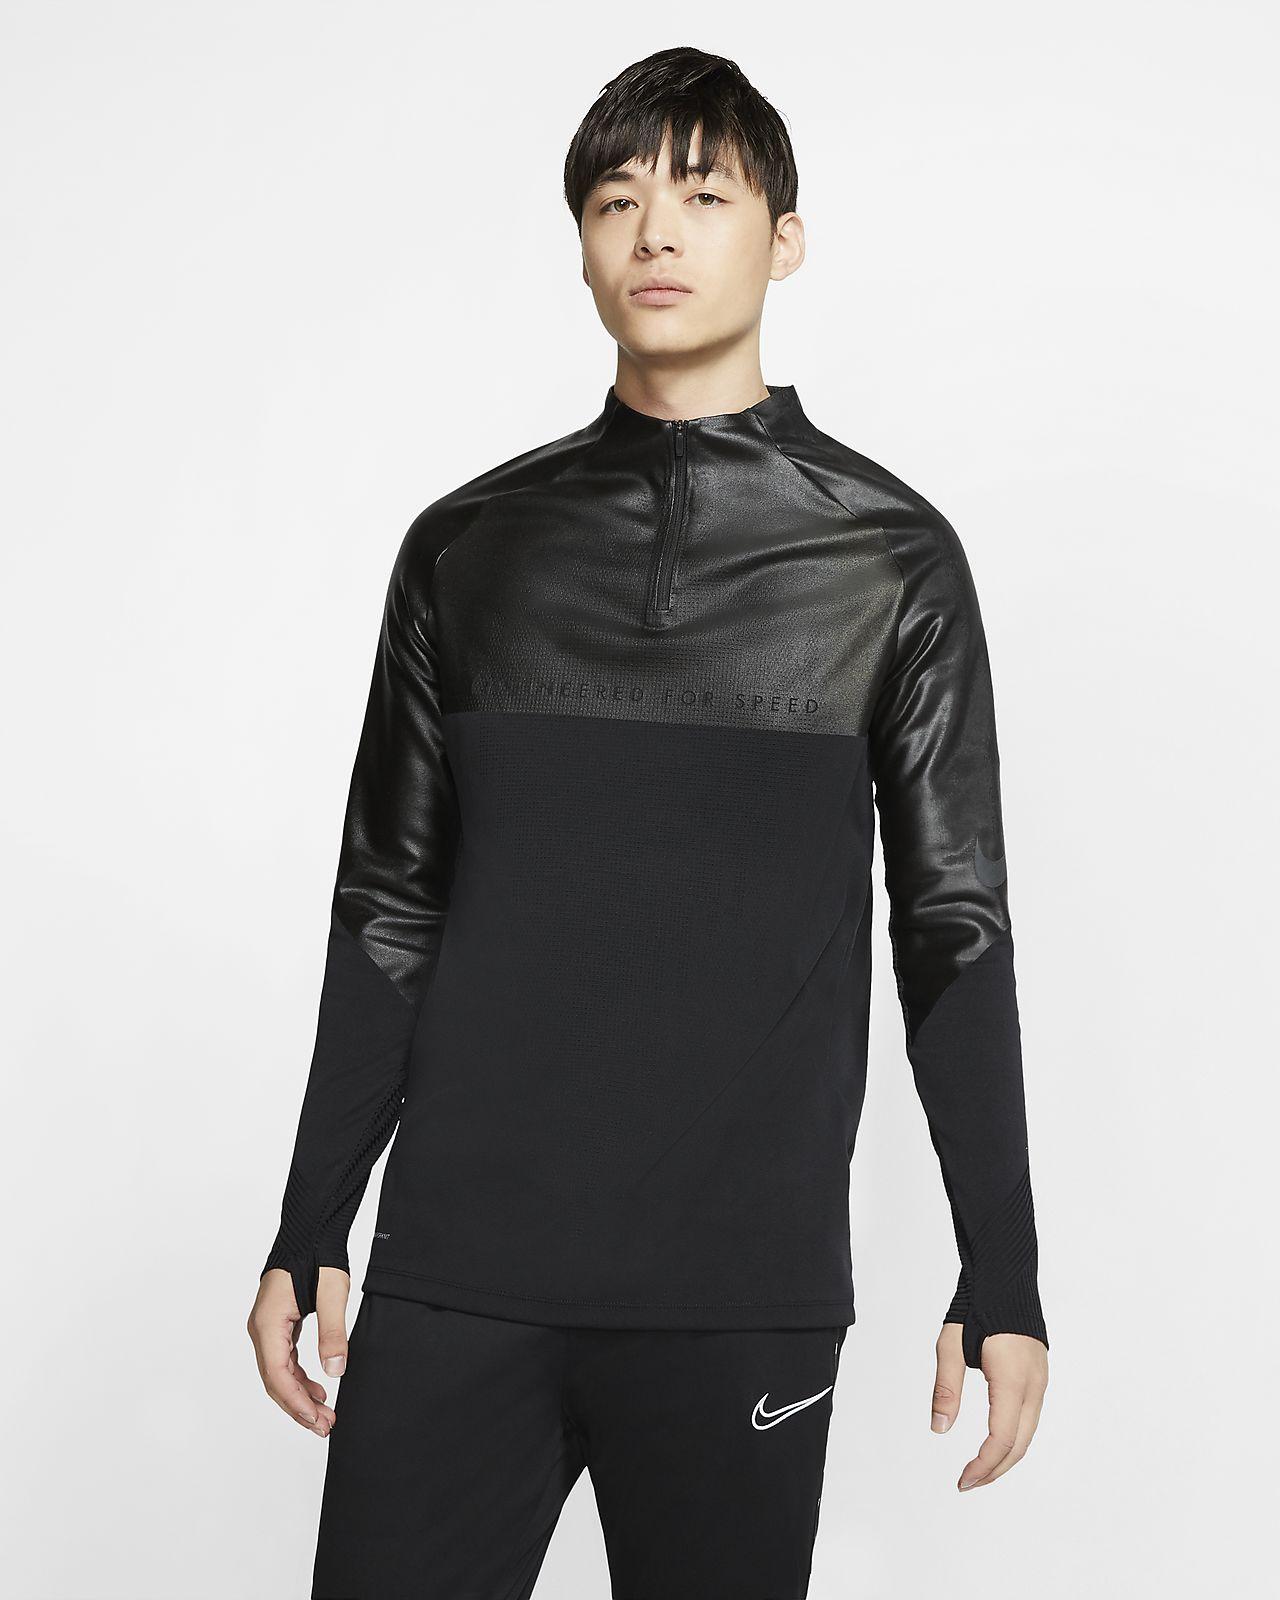 Мужская футболка для футбольного тренинга Nike VaporKnit Strike